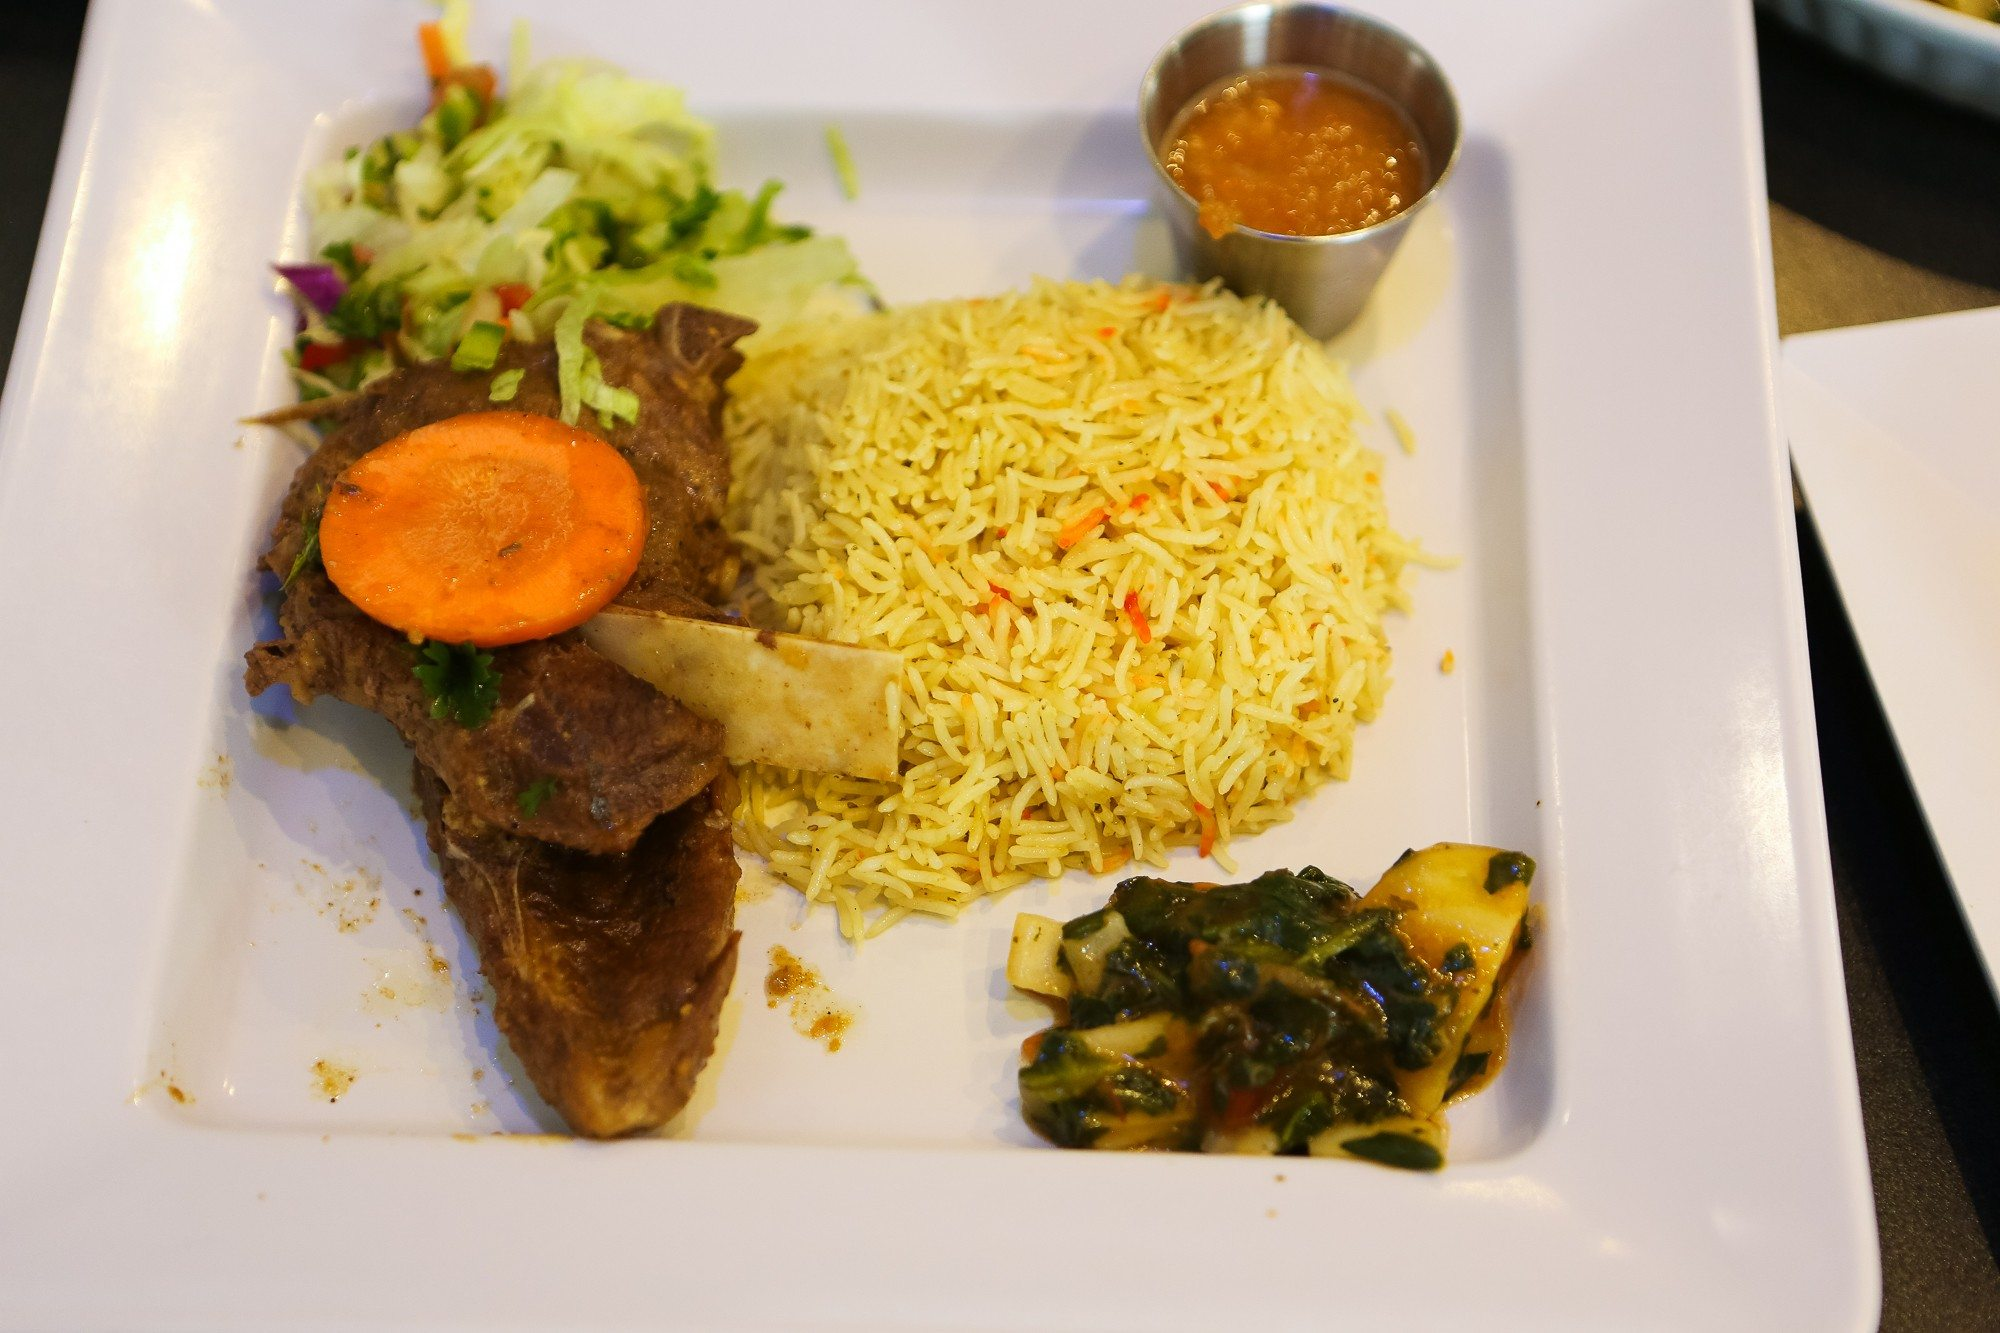 toronto-restaurants-chefs-in-the-burbs-bashir-munye-somali-rexdale-istar-goat-rice